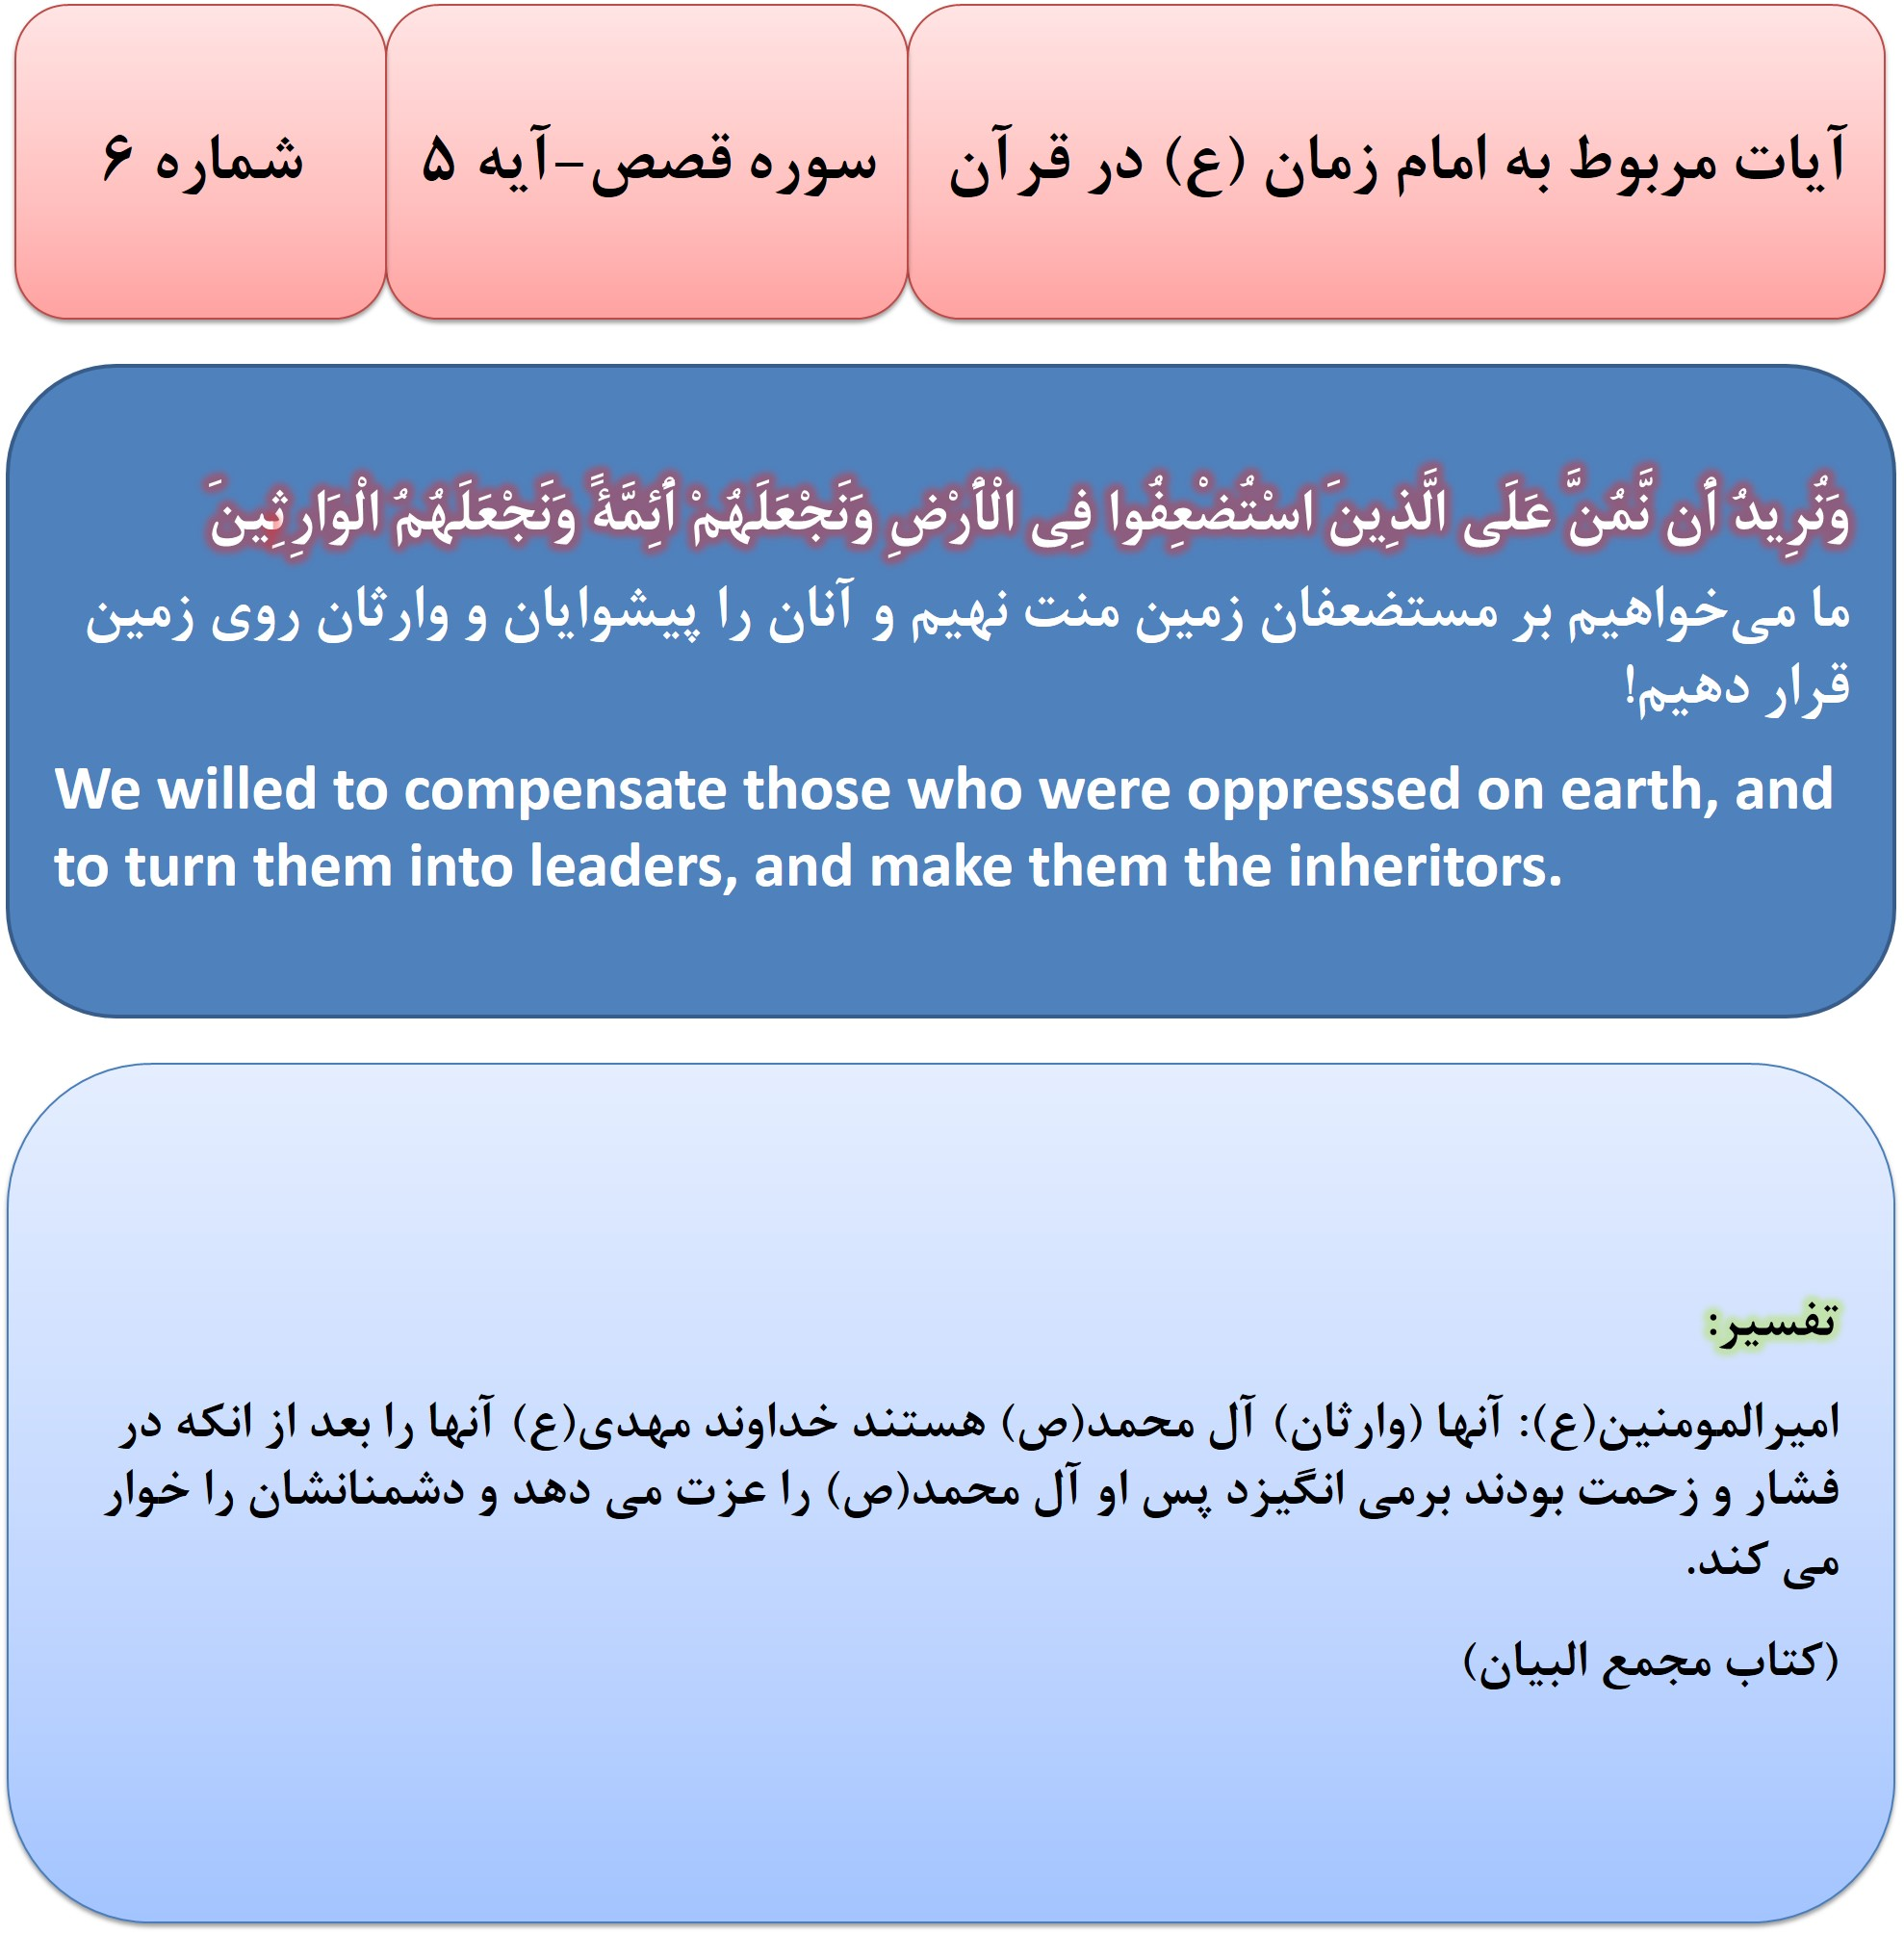 http://bayanbox.ir/view/5135278351296384708/Mahdi-In-Quran-6.jpg